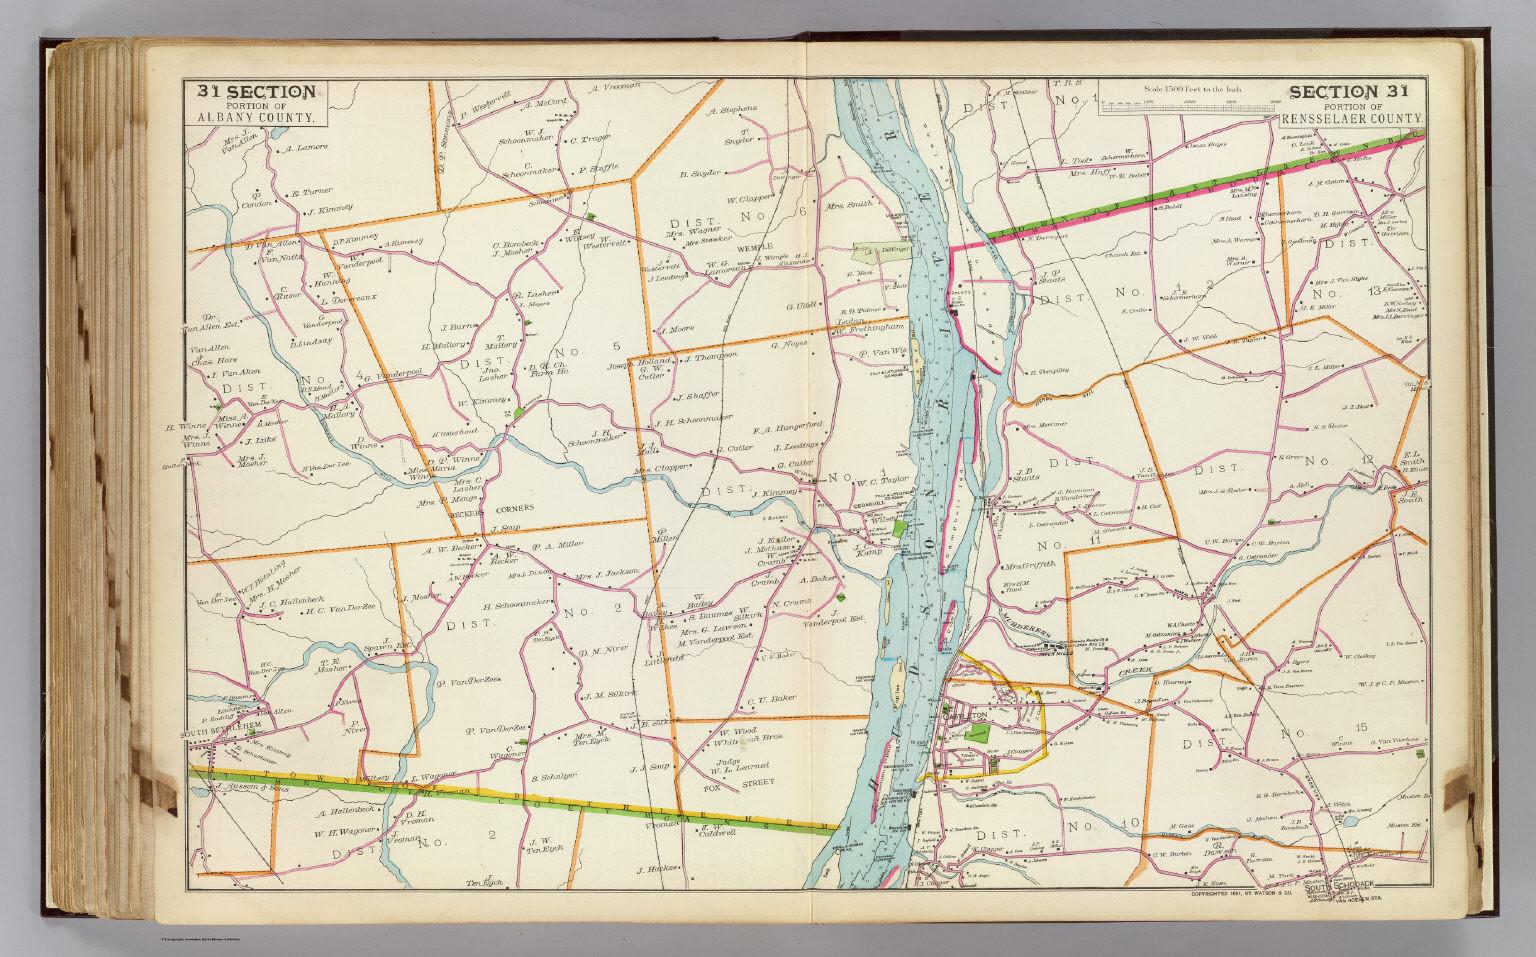 31 Albany, Rensselaer counties.